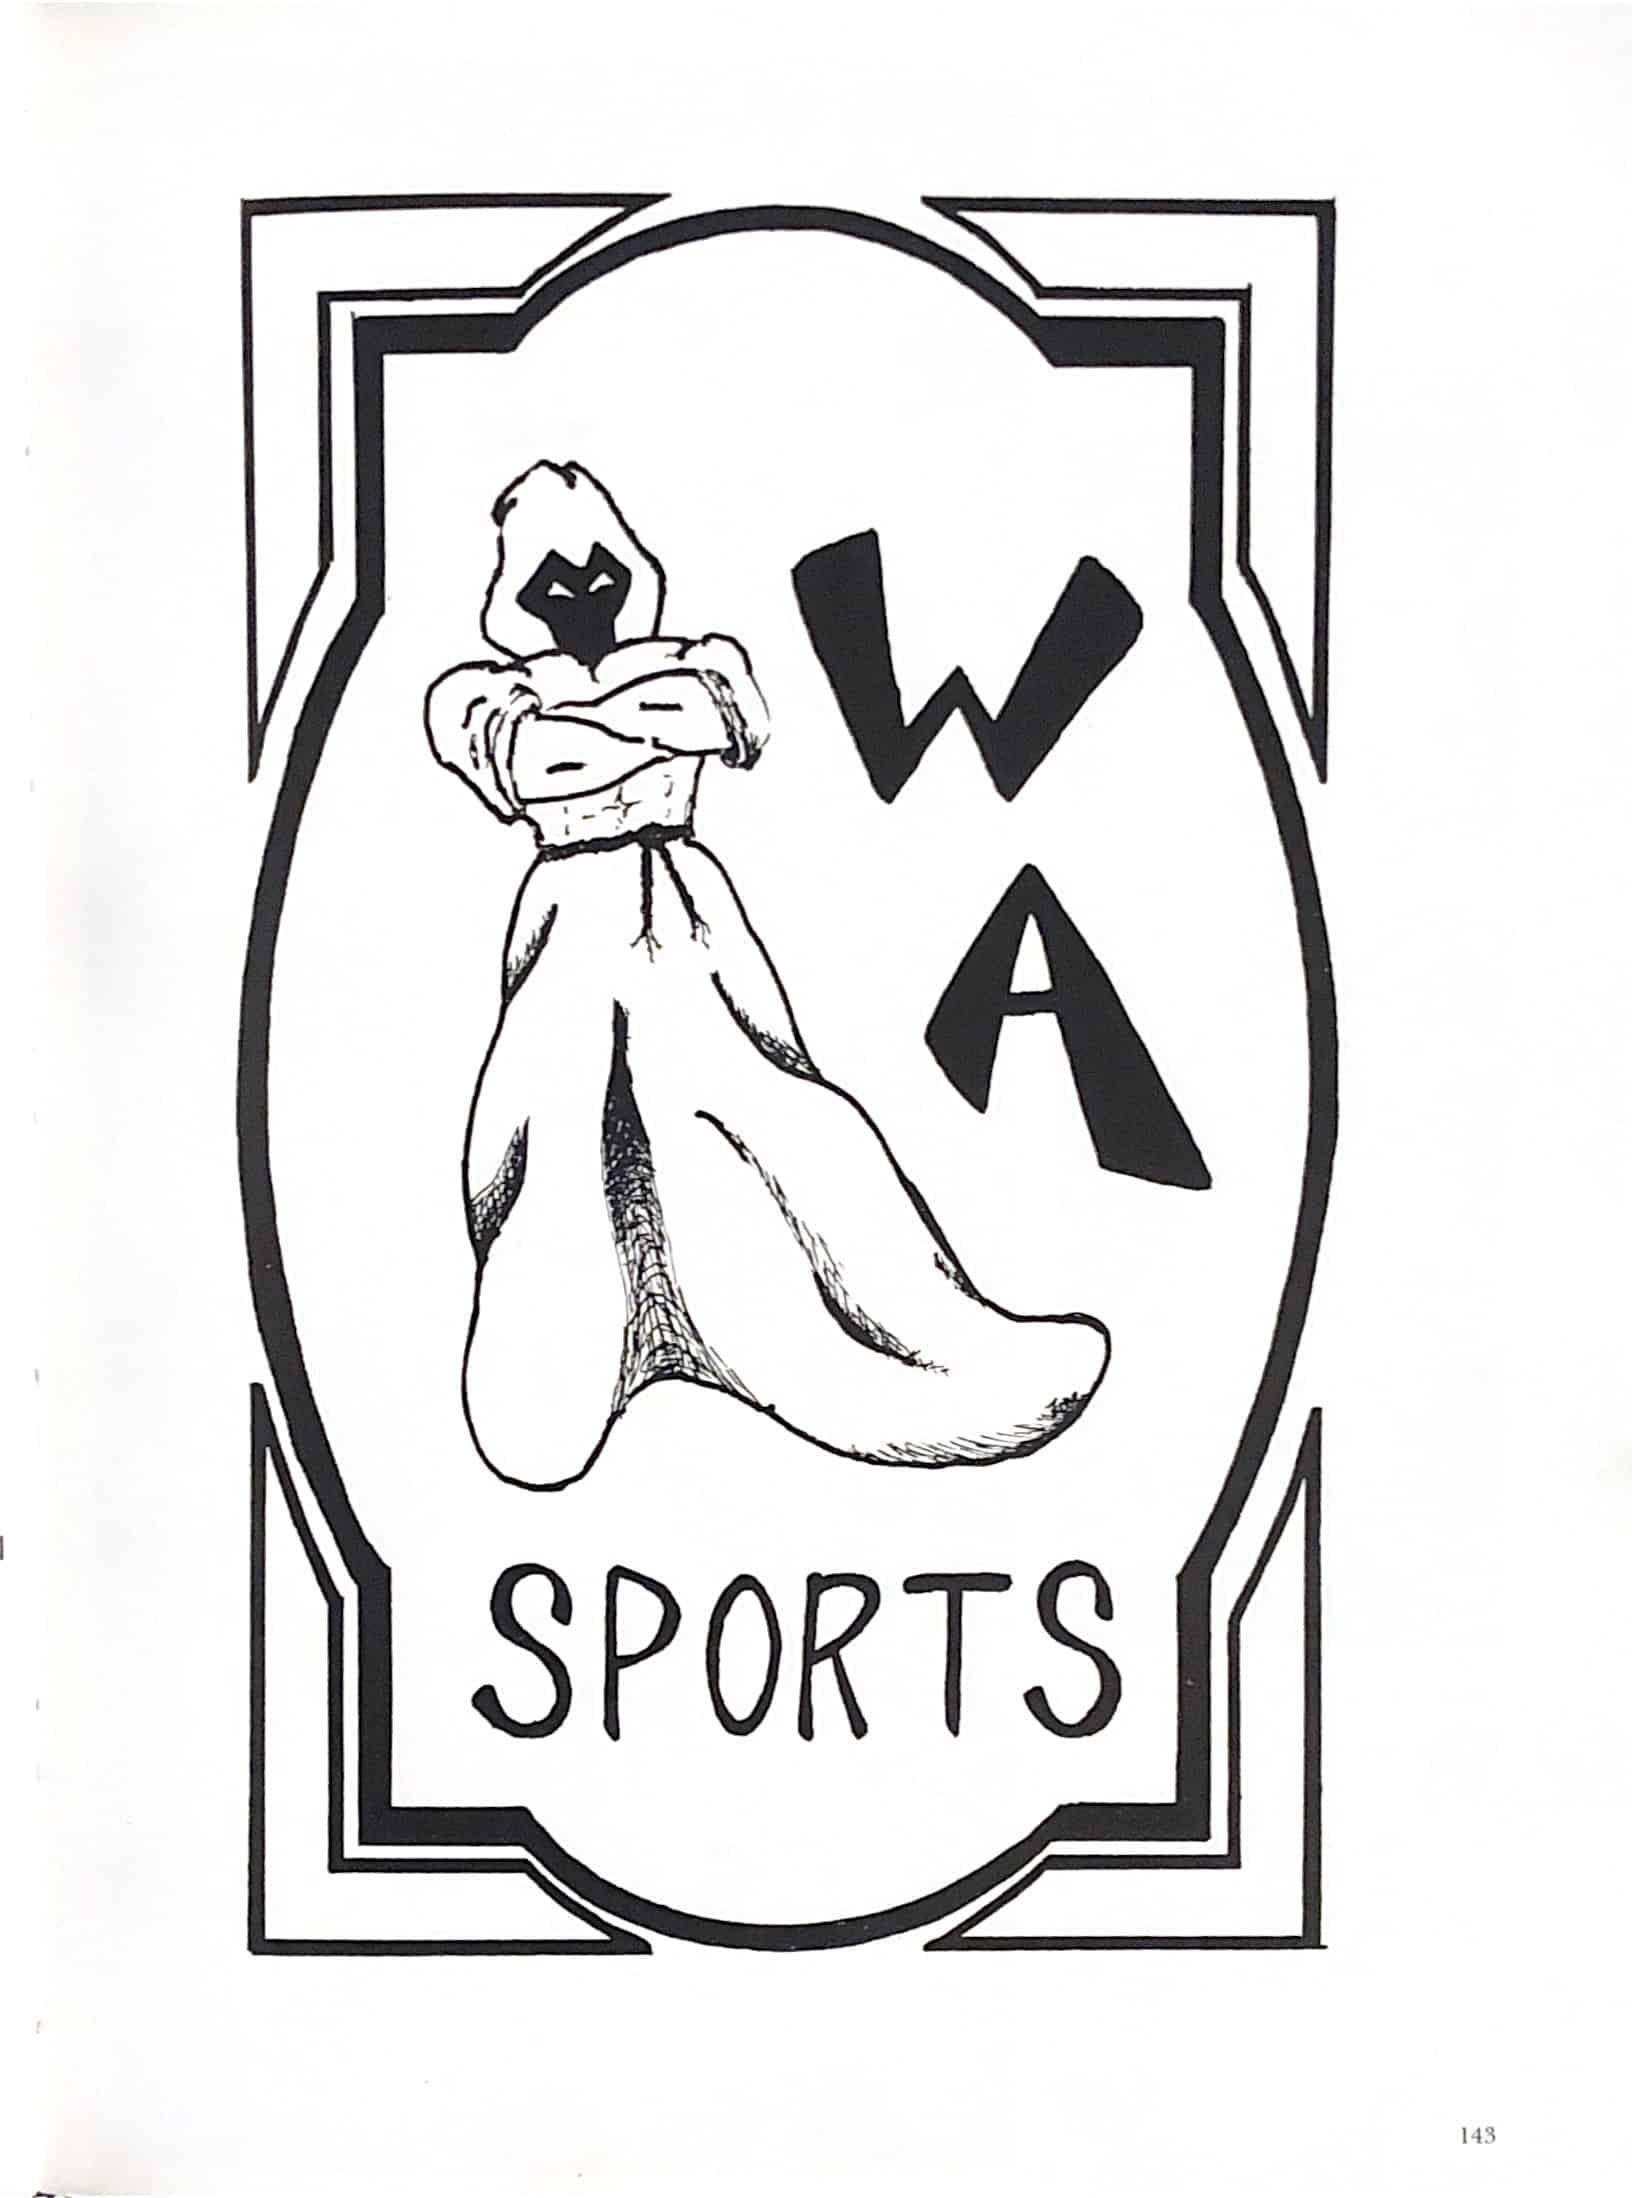 1982 Yearbook Interior